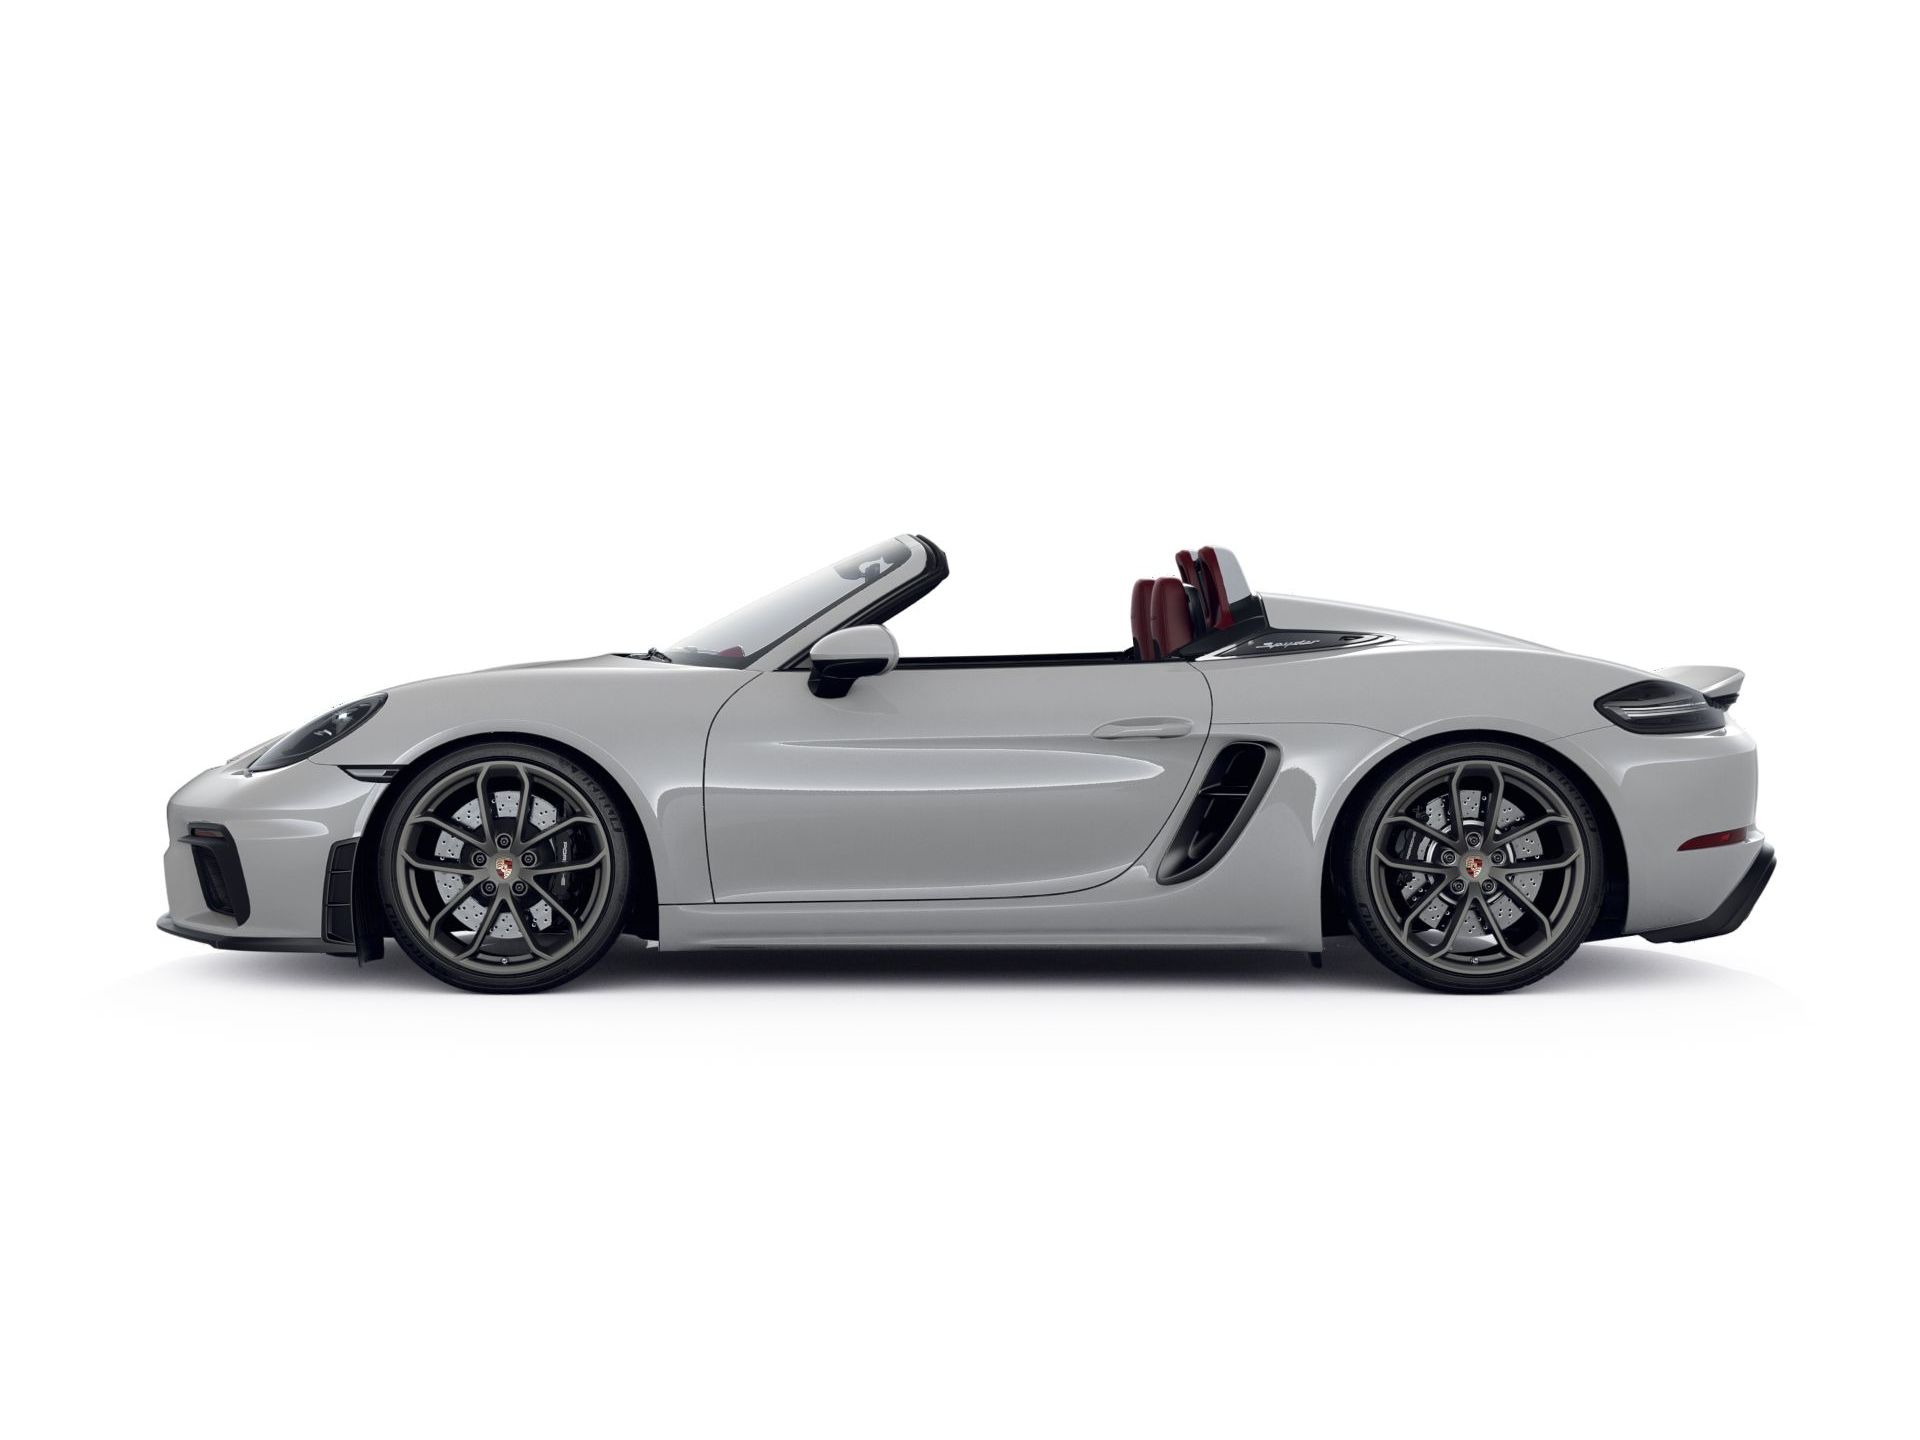 2022 Porsche 718 Spyder – 2